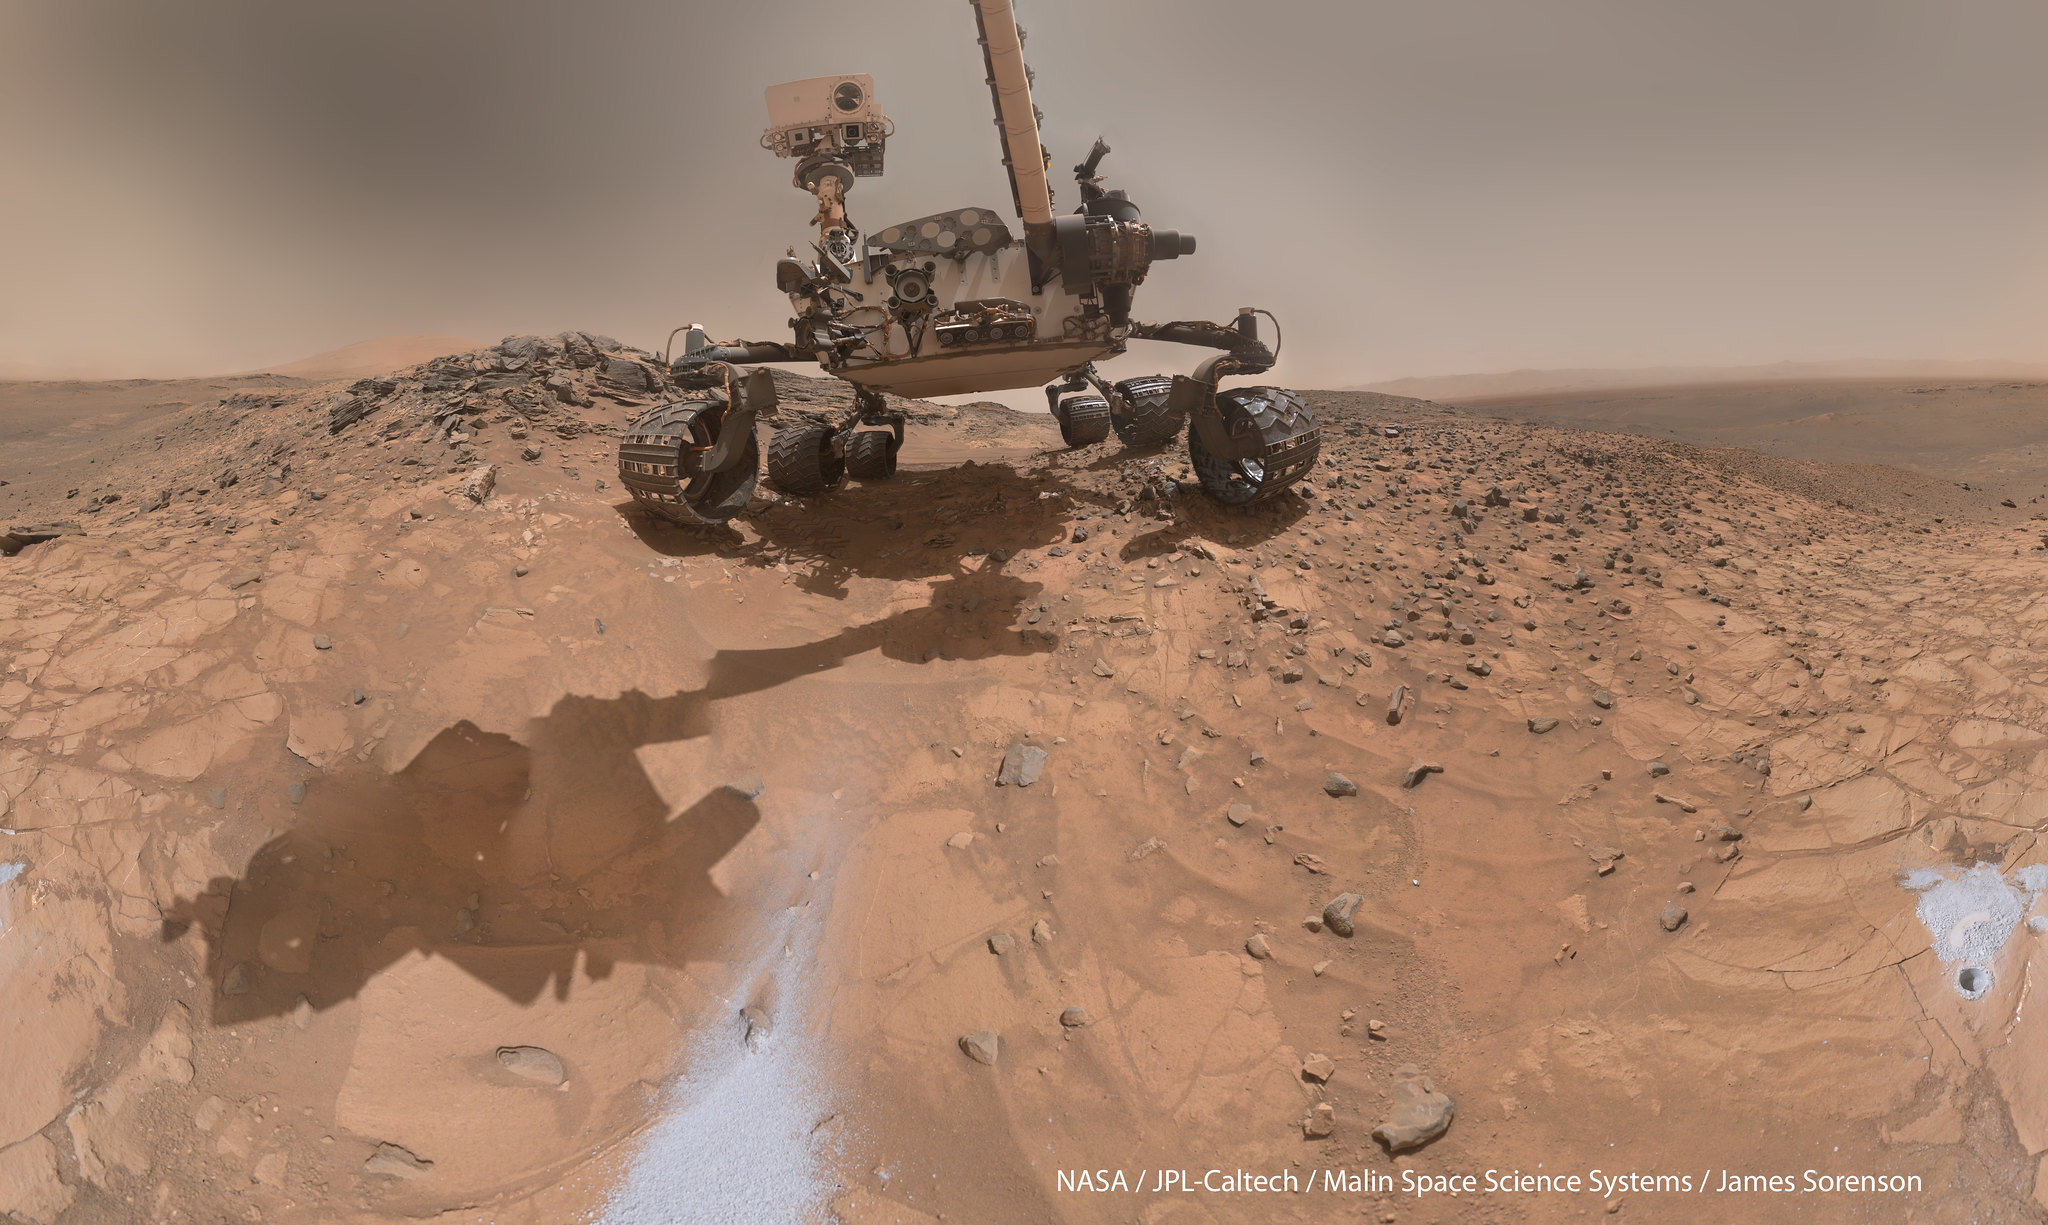 Mars Mission 20193679929_8fedc1b75a_k